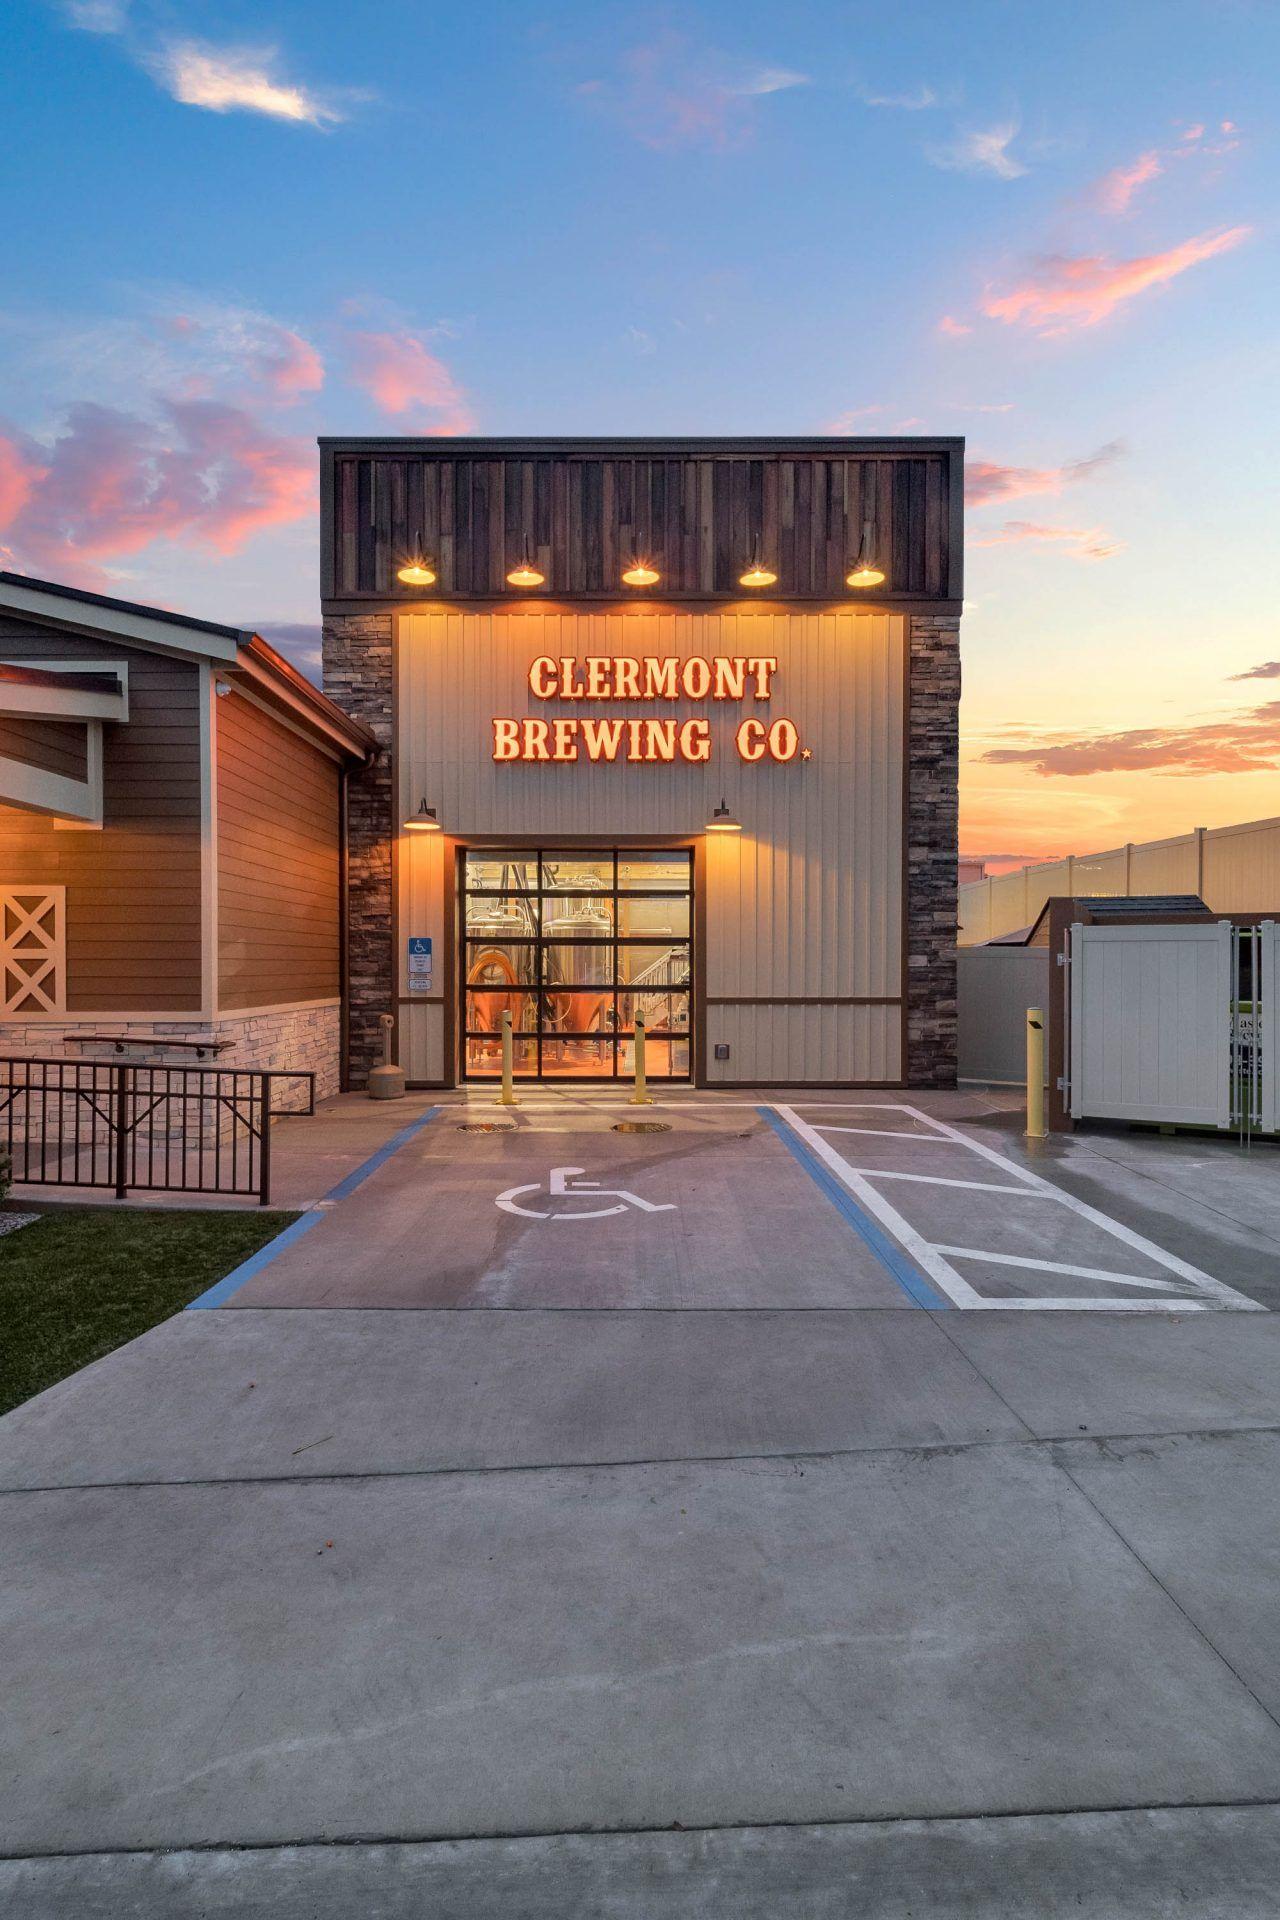 11+ Florida craft beer news ideas in 2021